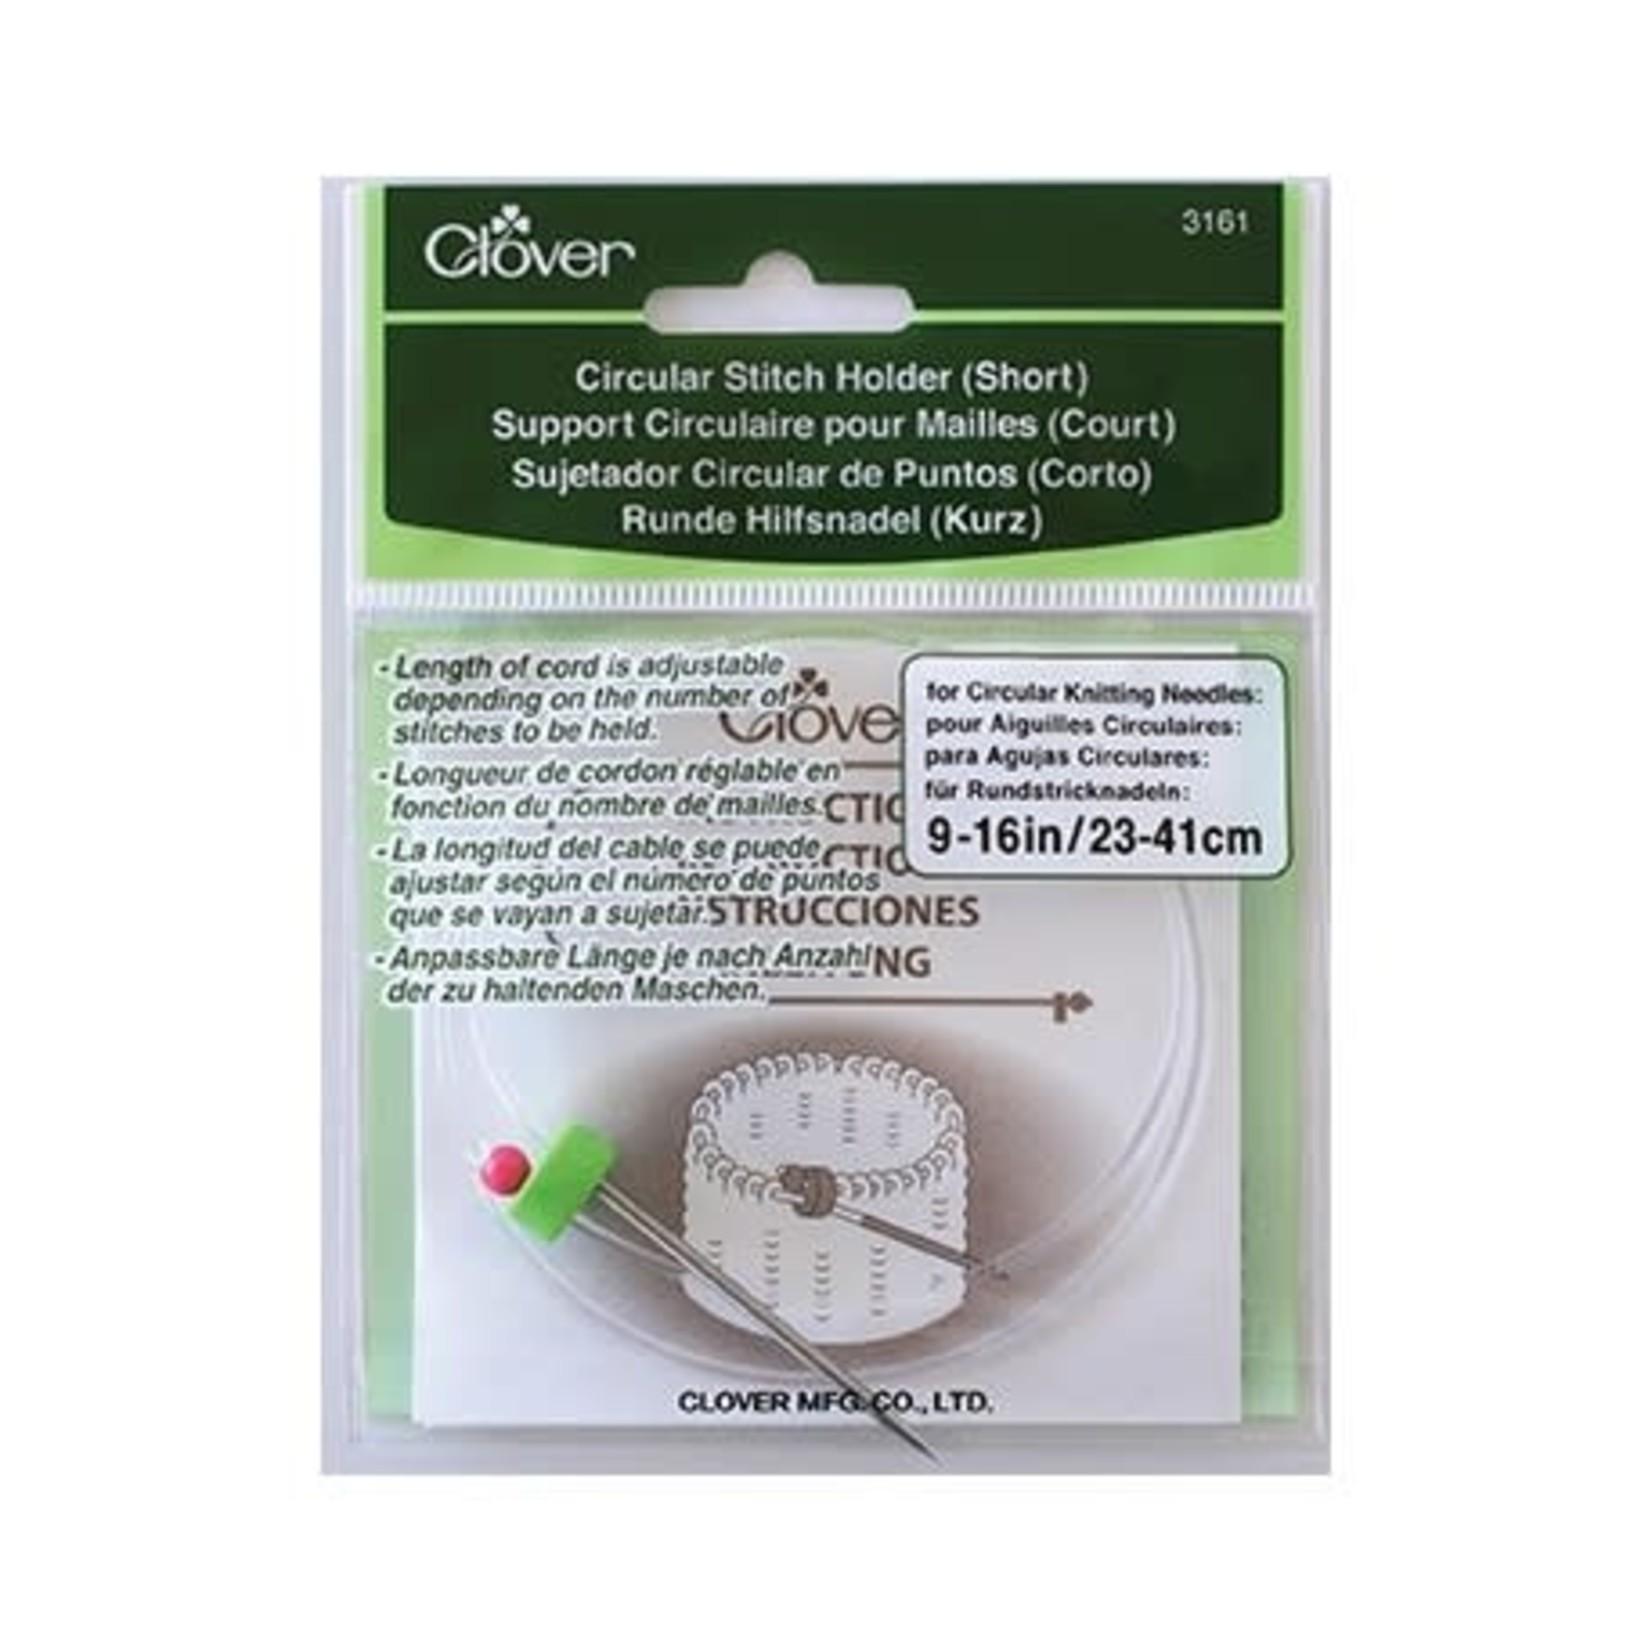 Clover Clover Circular Stitch Holder